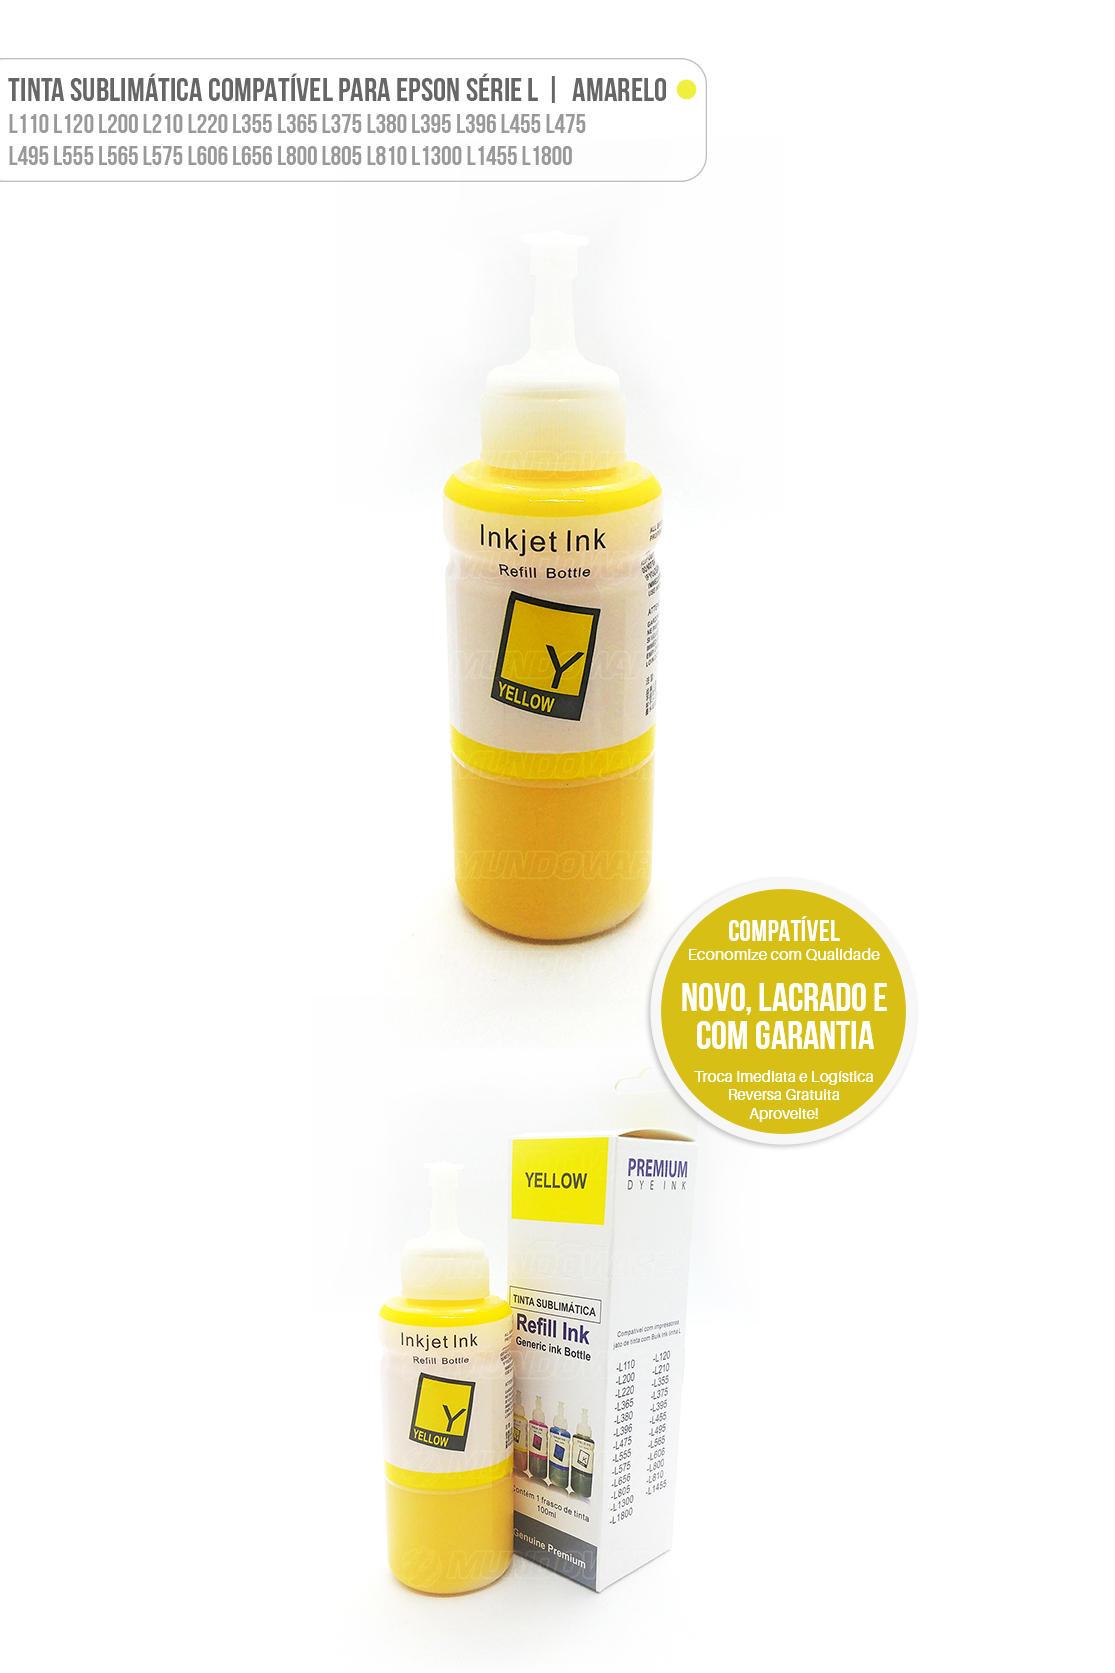 Refil de Tinta Sublimática Amarela Compatível para Epson Ecotank série L L200 L210 L220 L355 L365 L375 L555 L575 L800 L805 L1300